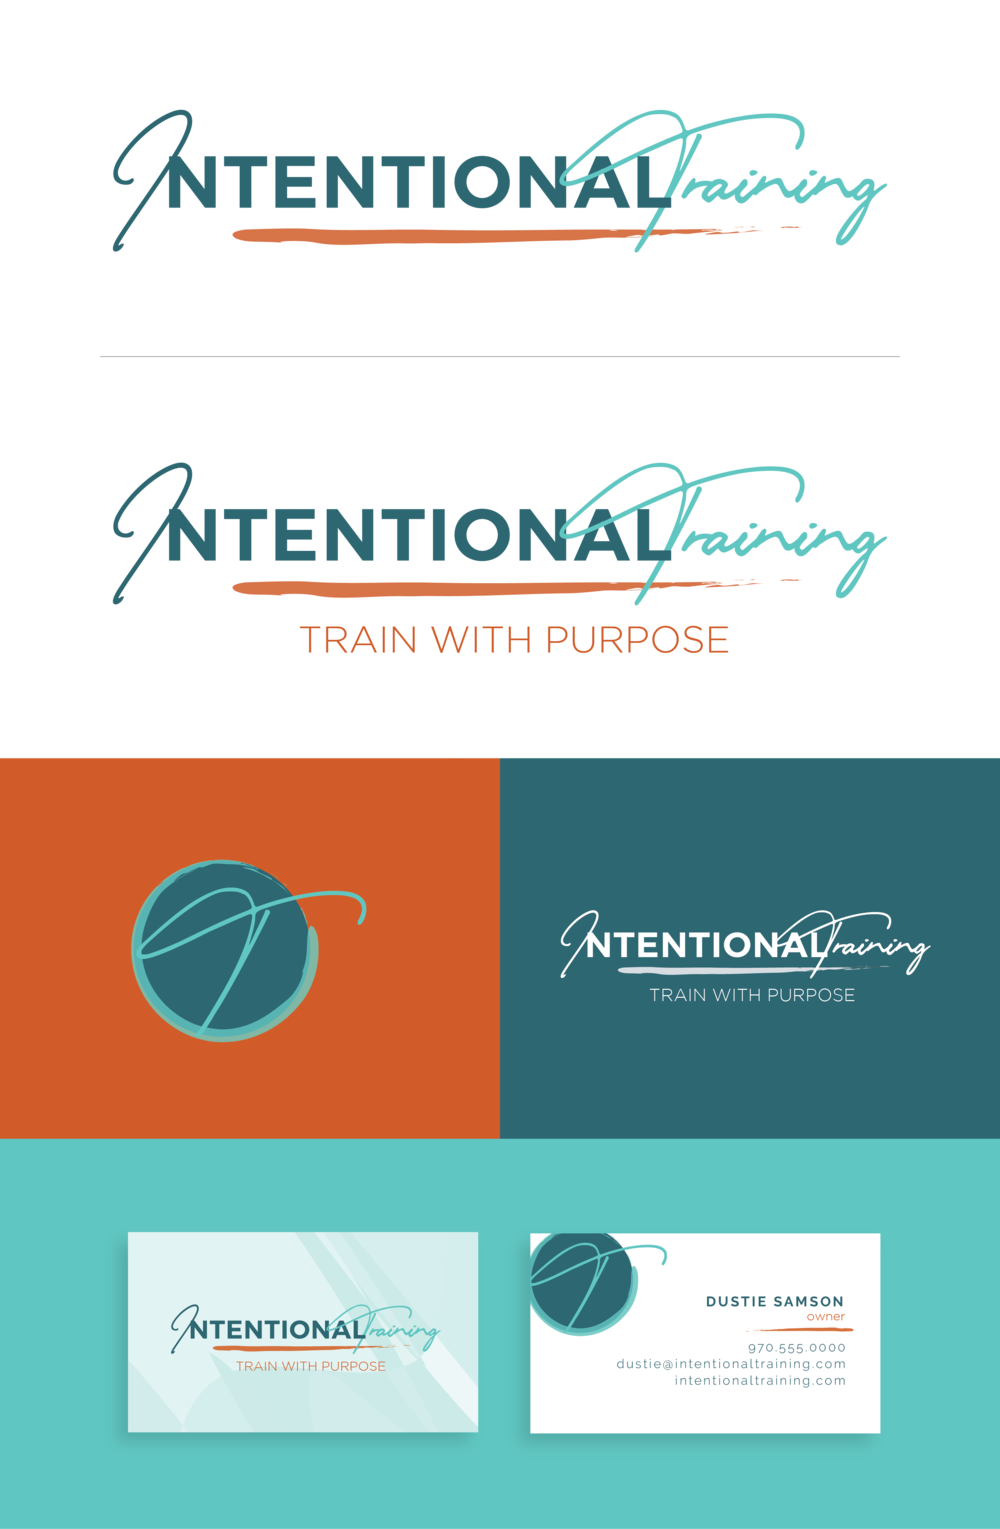 IntentionalTraining_FirstLook-04.png